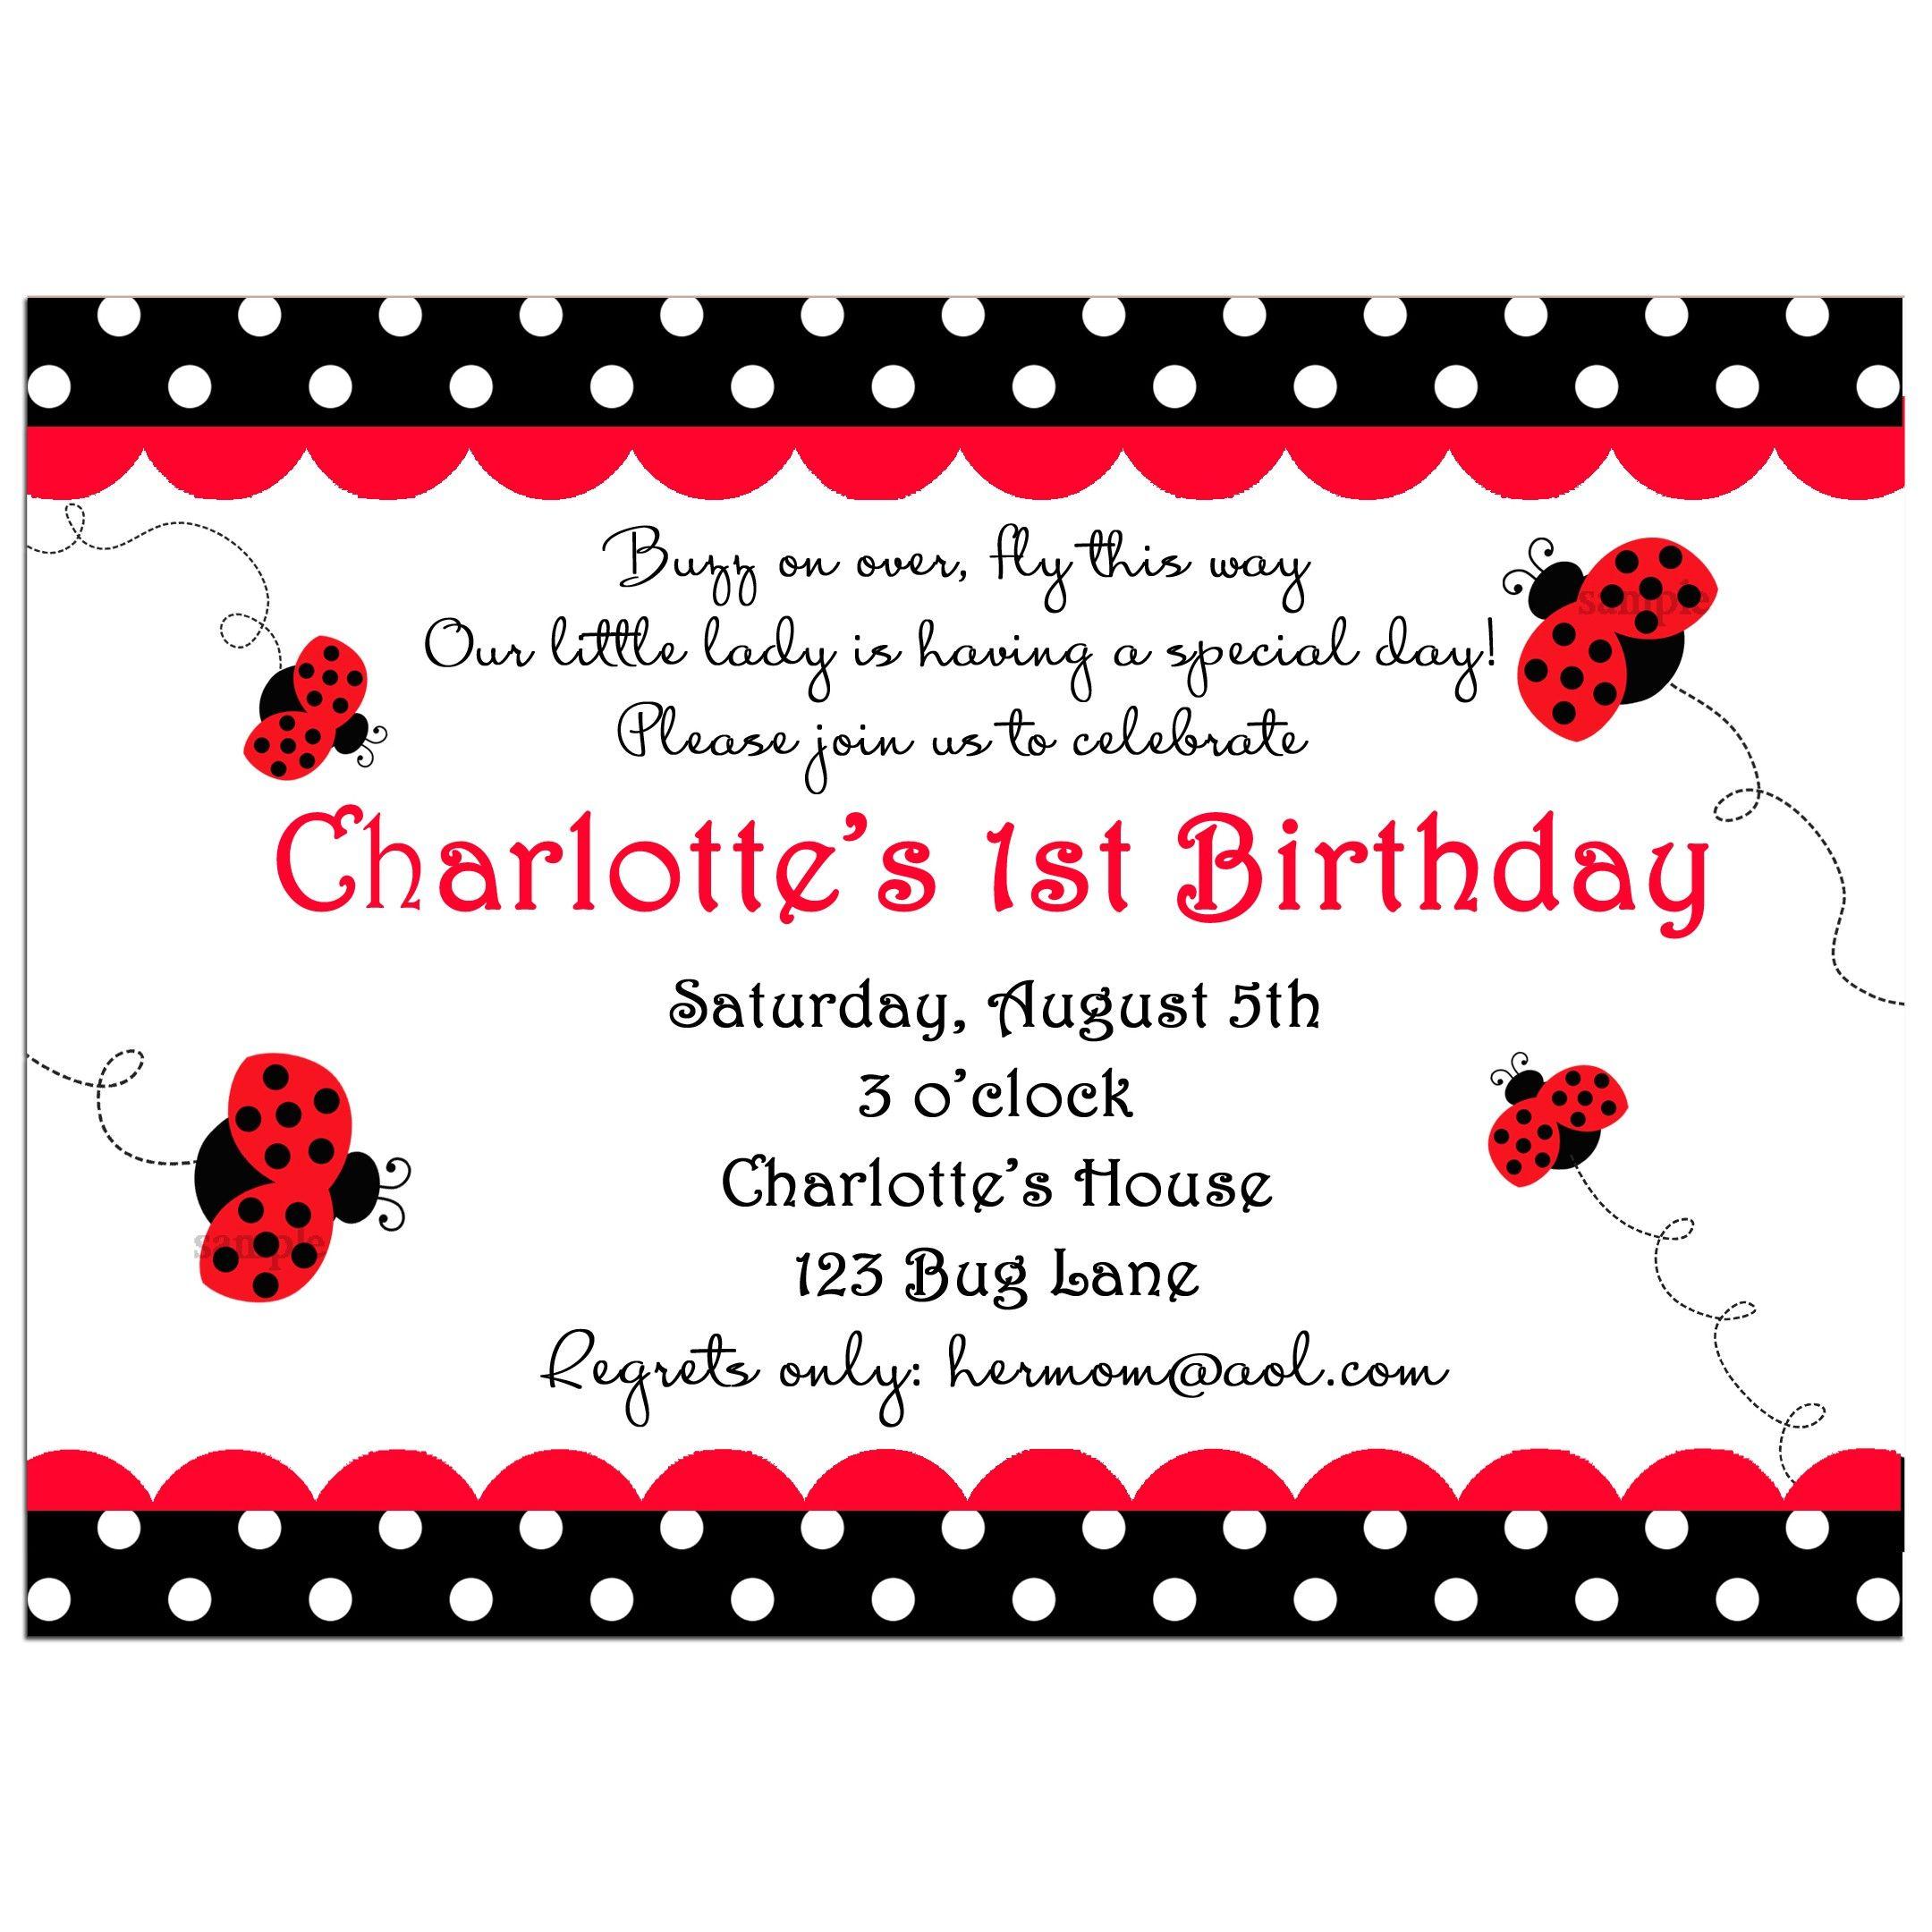 Ladybug Party Invitation My Little Lady Party Ideas Pinterest